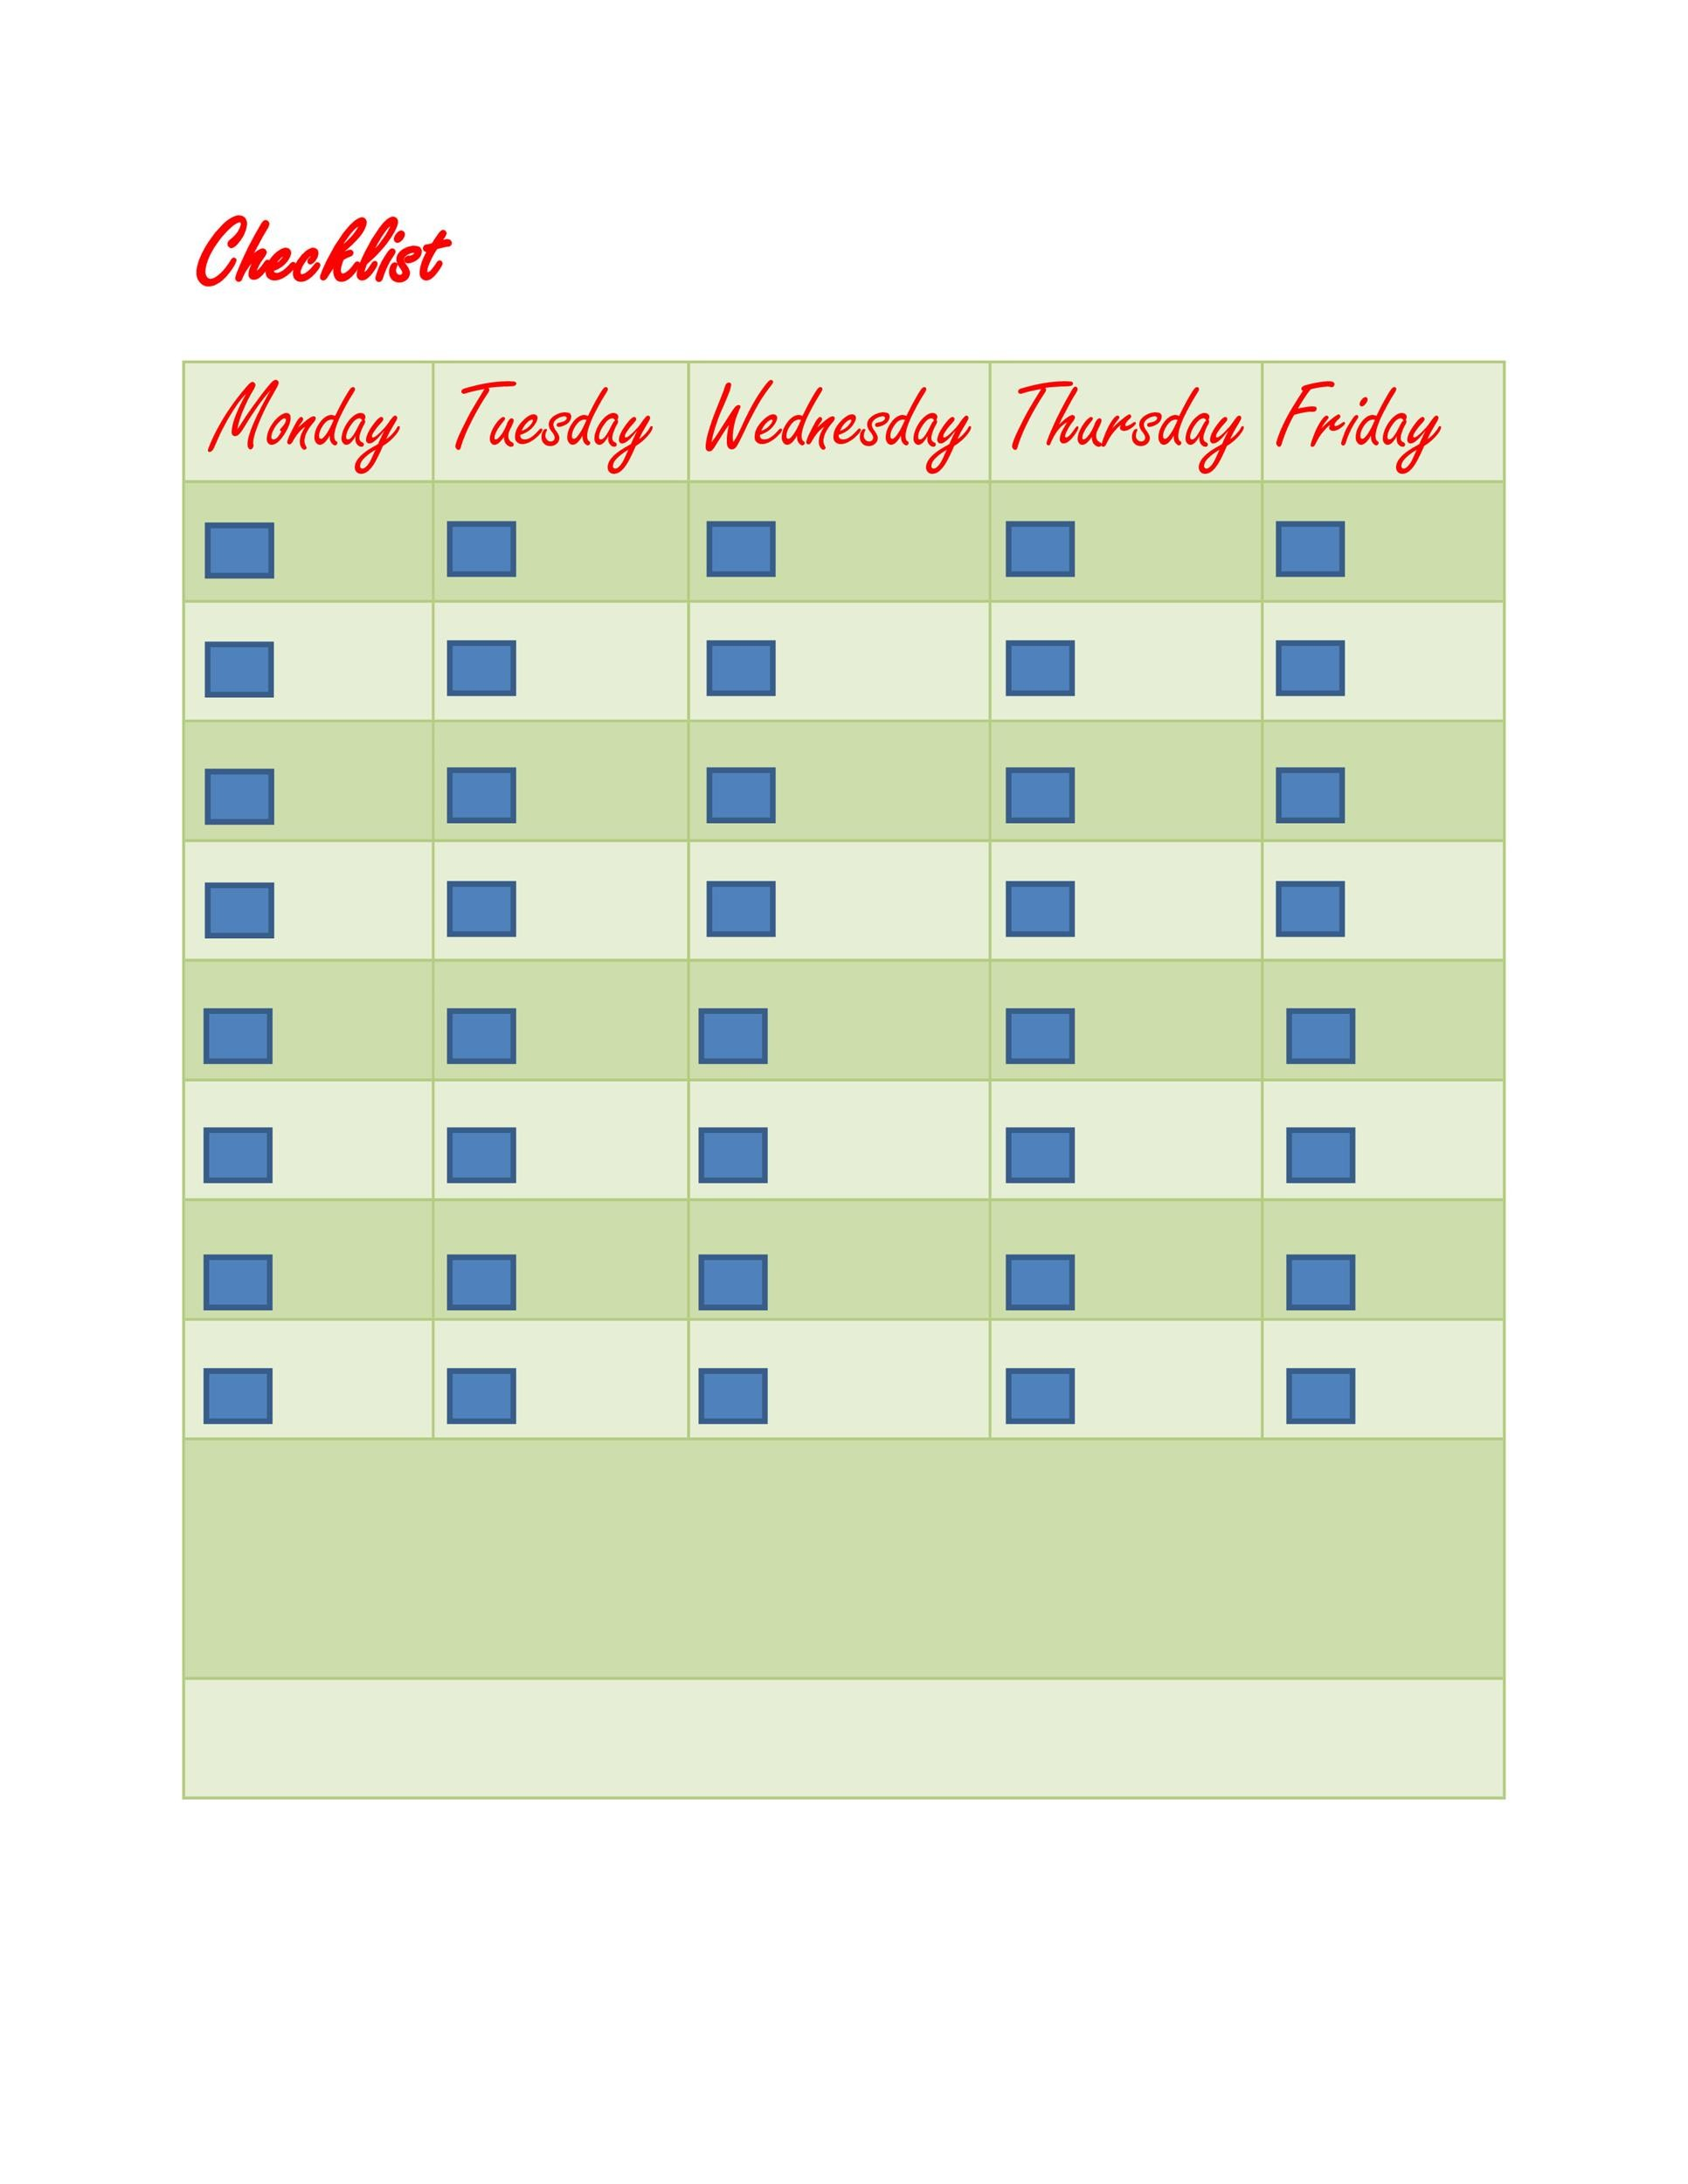 Checklist Template 08